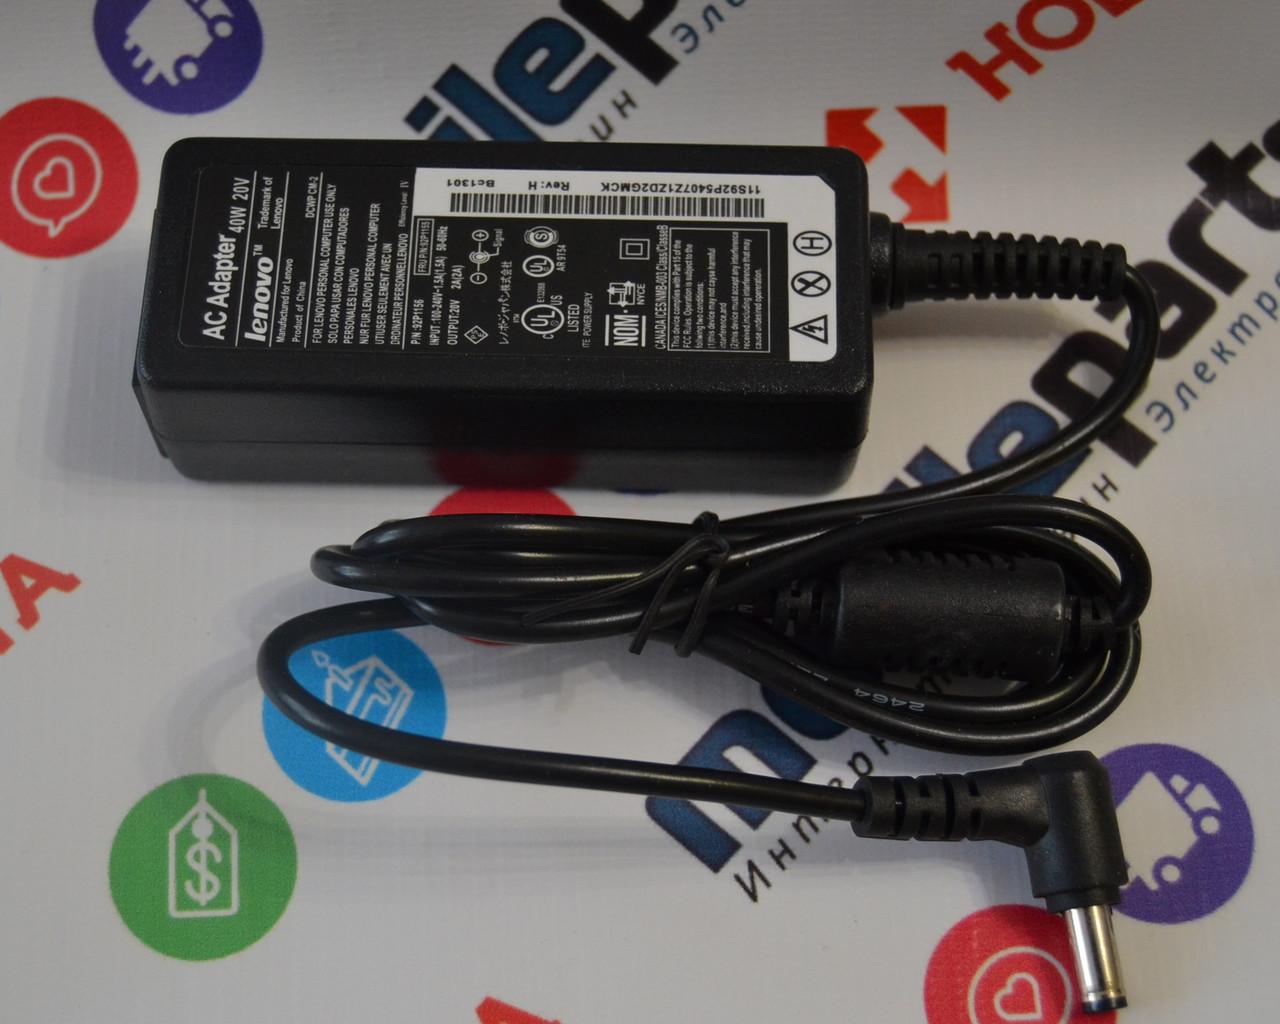 Блок питания для ноутбука Lenovo 20V 2A 40W 5.5mm*2.5mm IdeaPad S9 S9E S10 S10E S12 U310 | MSI Wind U115 U120H